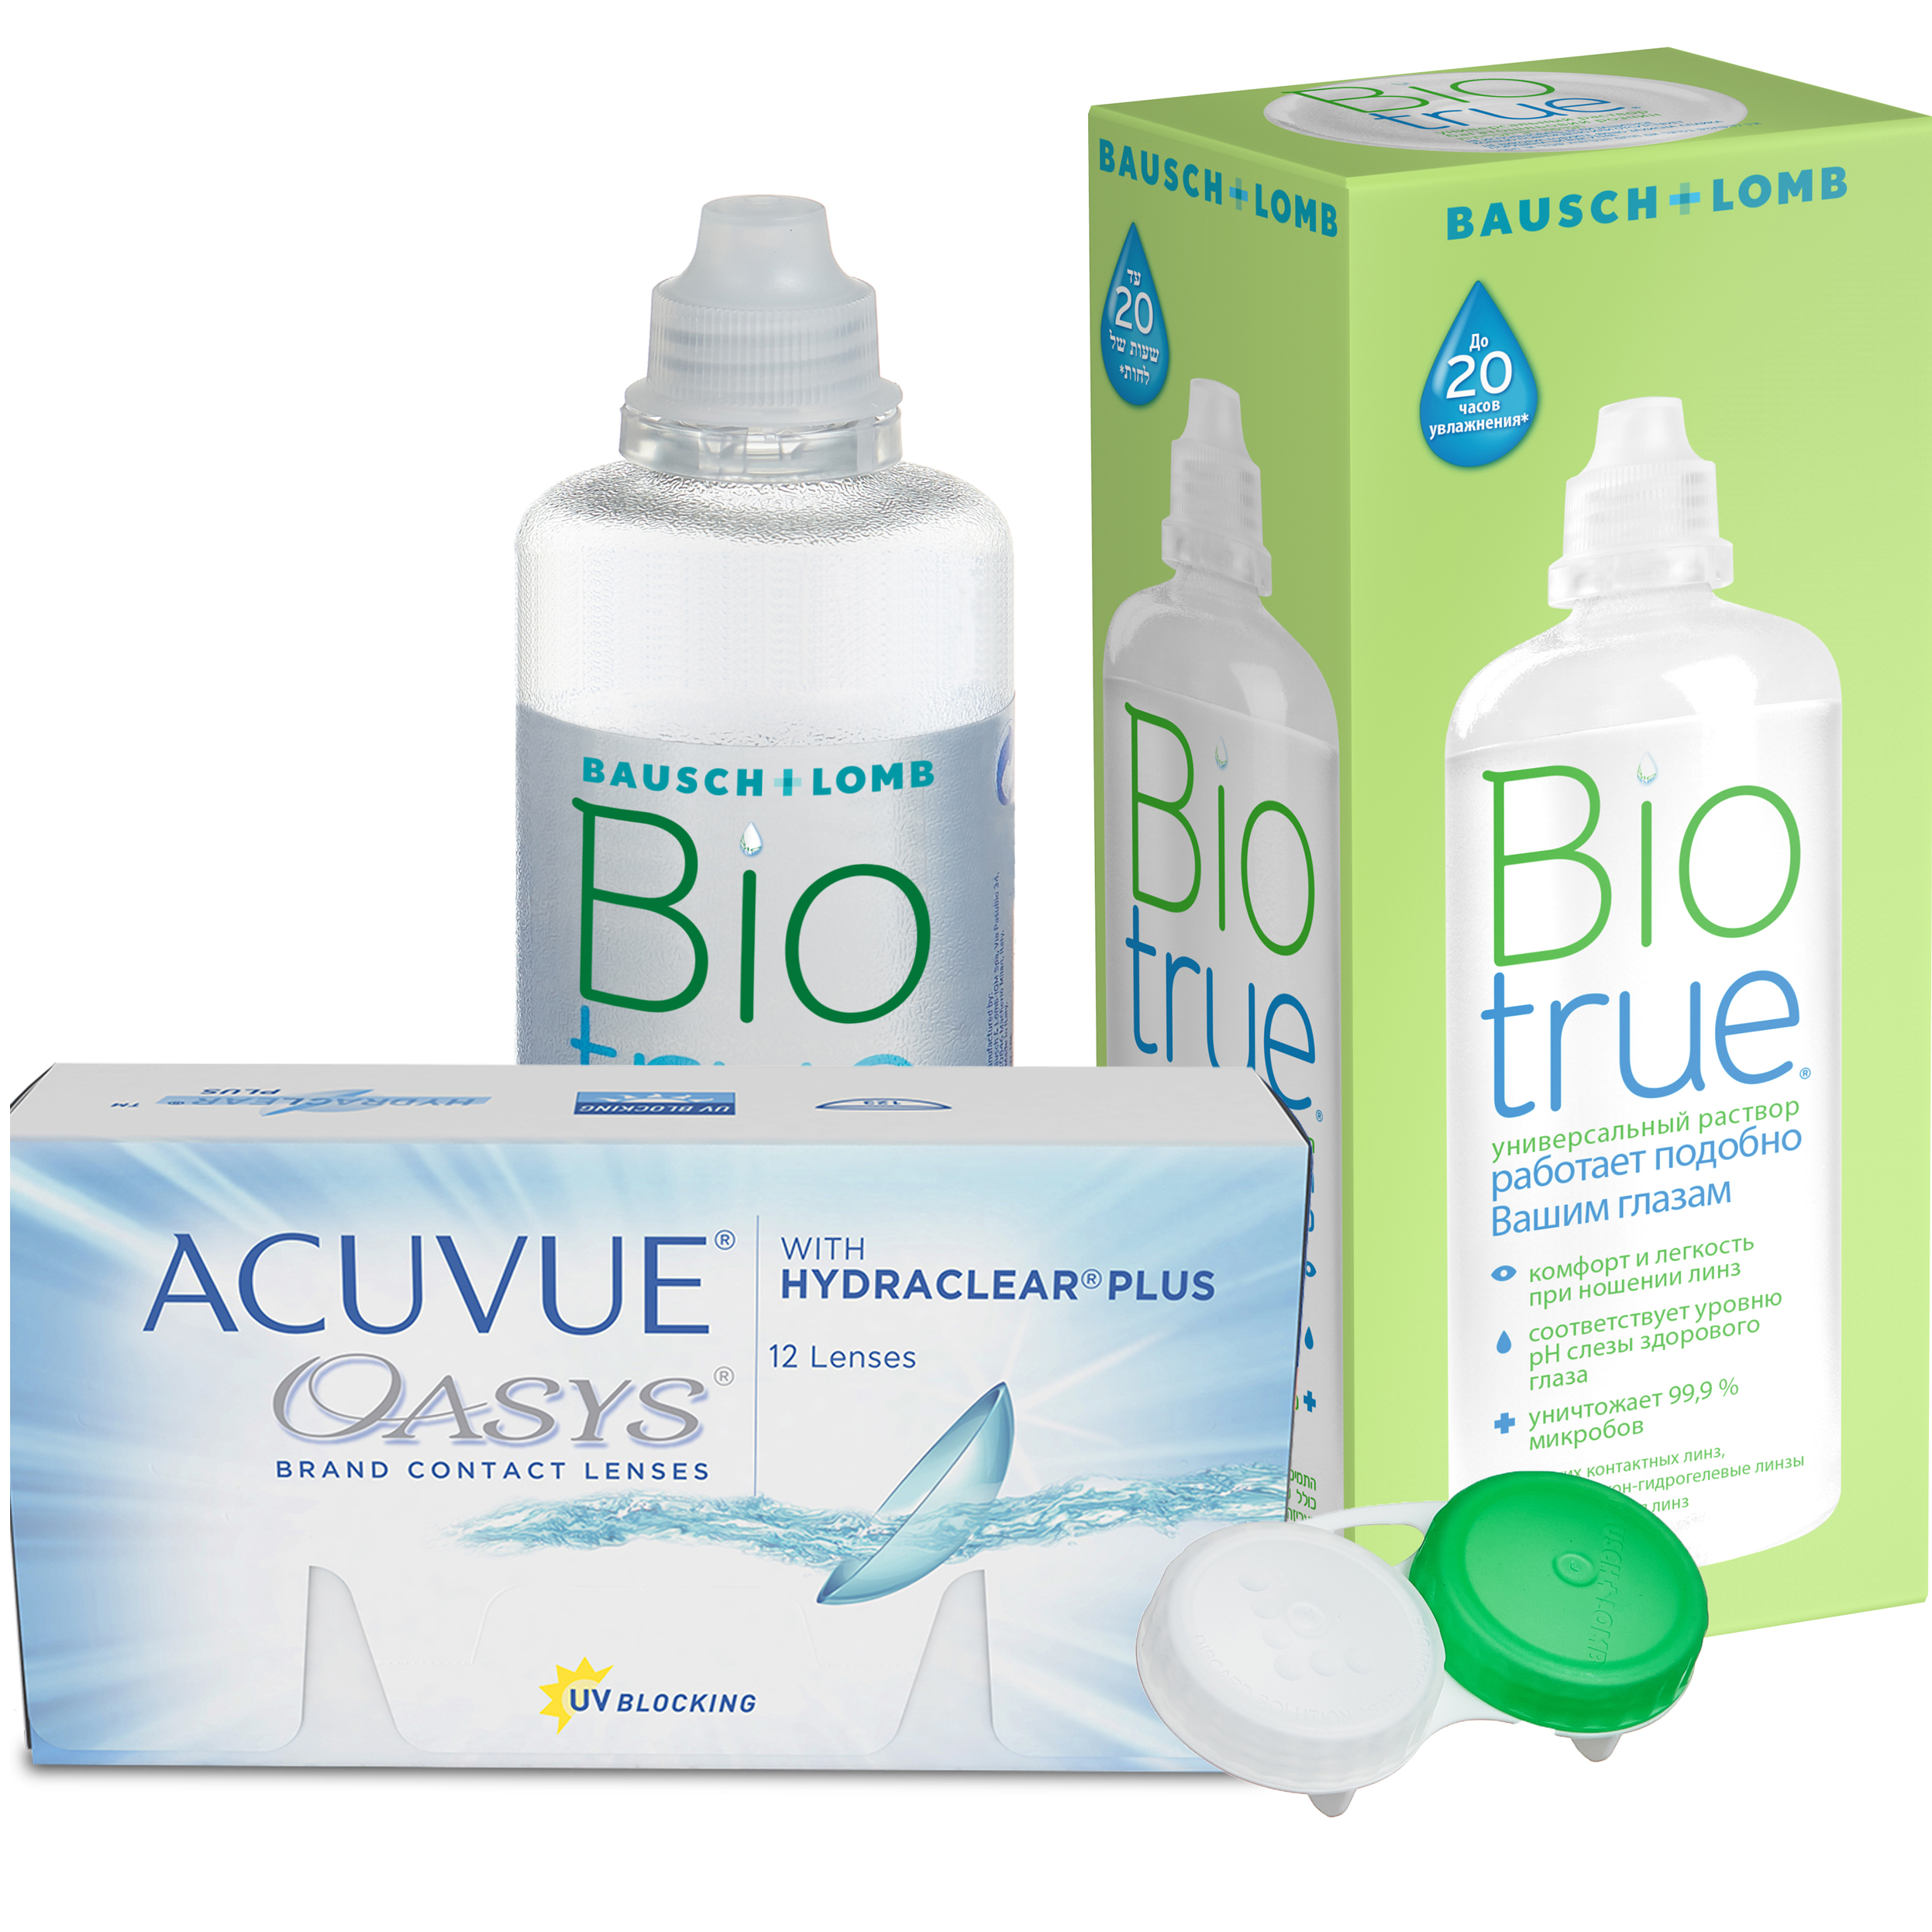 Купить Oasys with Hydraclear Plus 12 линз + Biotrue, Контактные линзы Acuvue Oasys with Hydraclear Plus 12 линз R 8.4 -8, 50 + Biotrue 300 мл